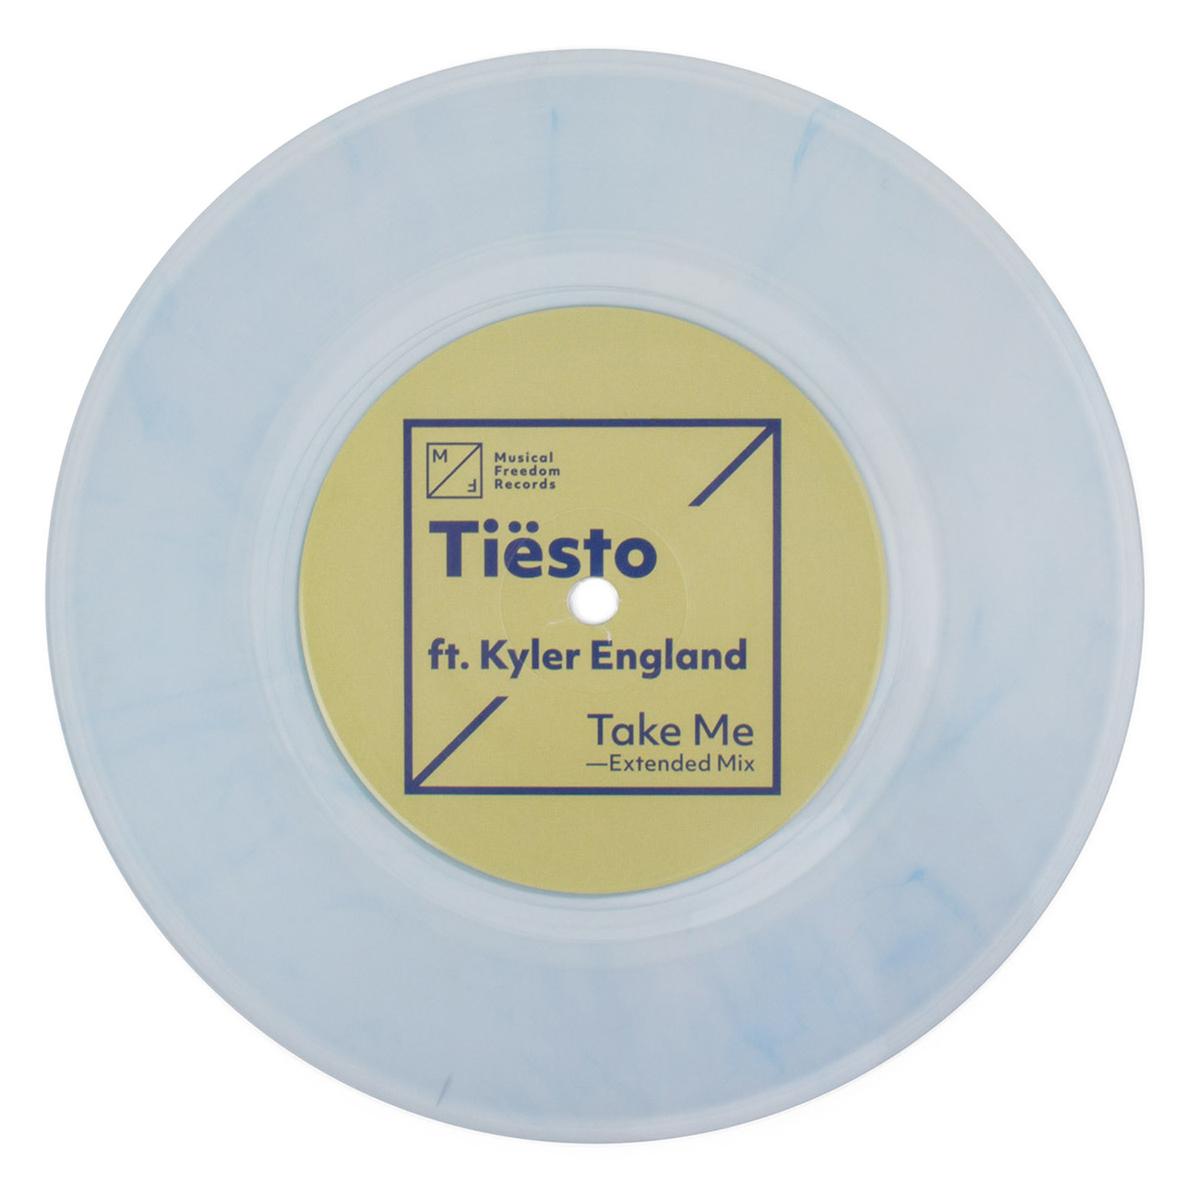 "Tiësto Ft. Kyler England 'Take Me' Single - 7"" Vinyl"